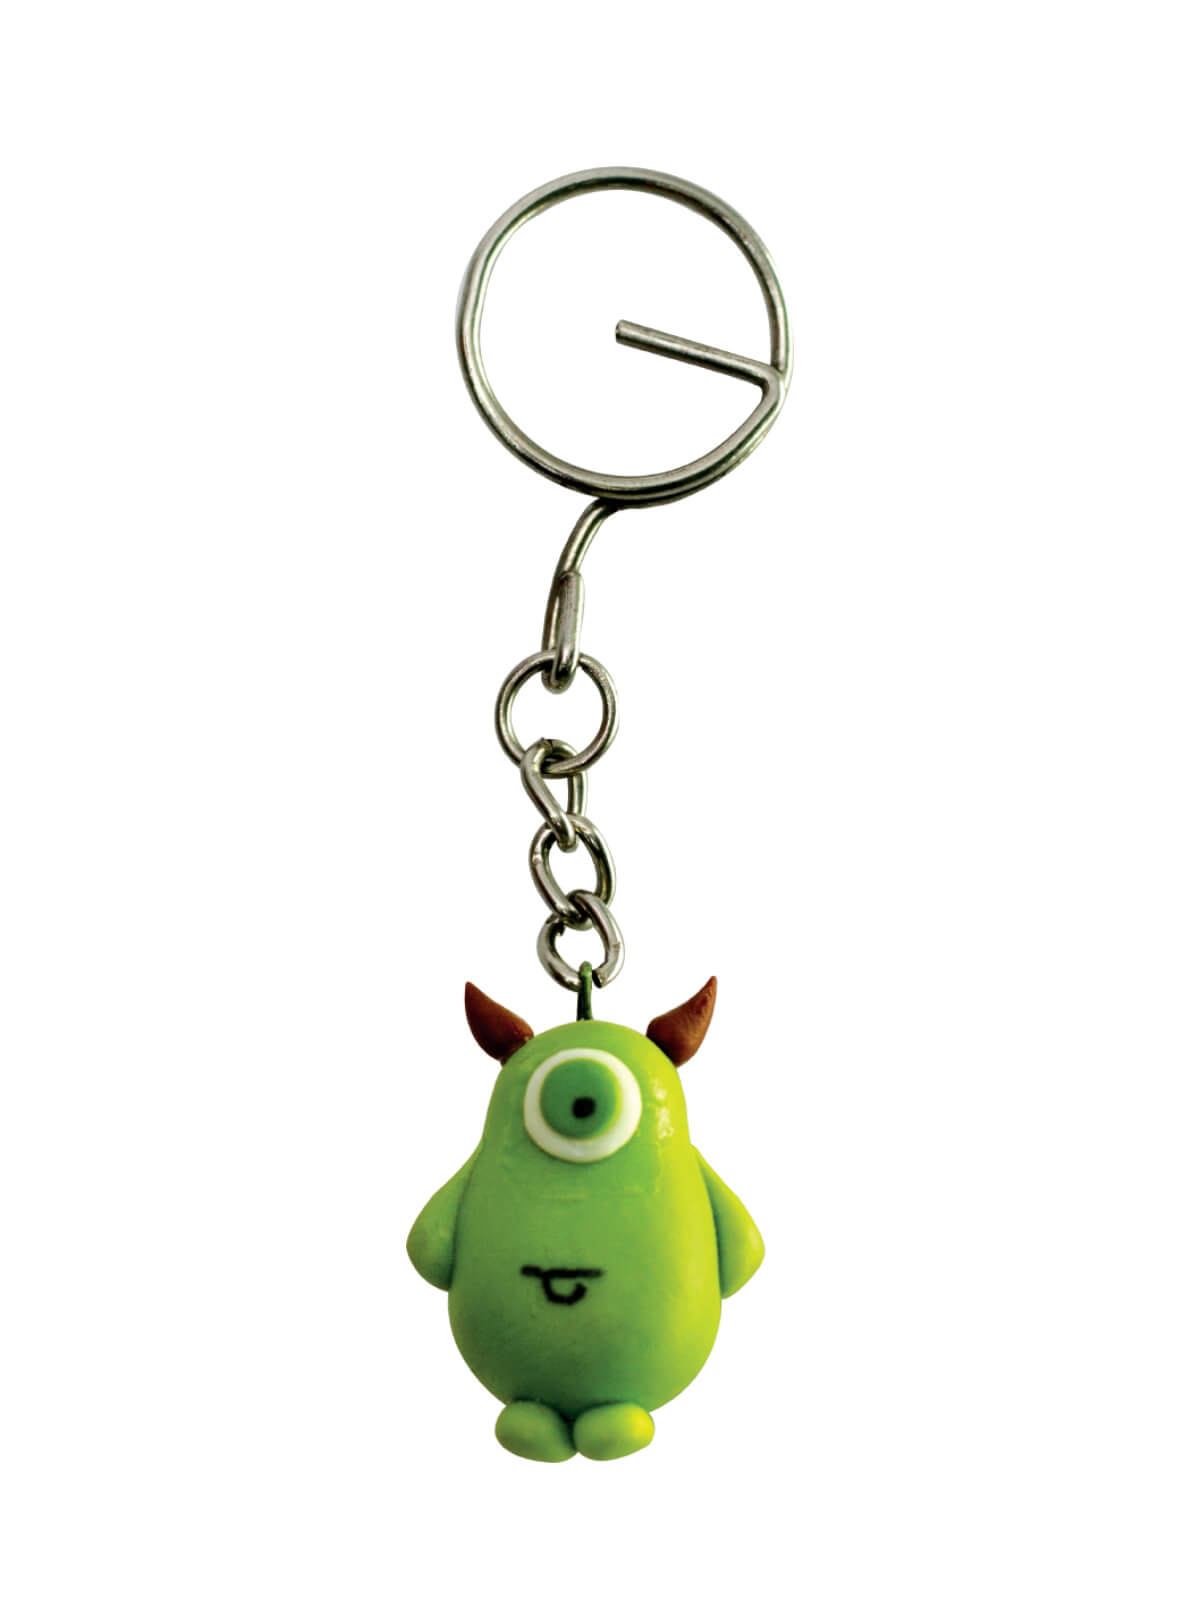 Green Cartoon Key Ring